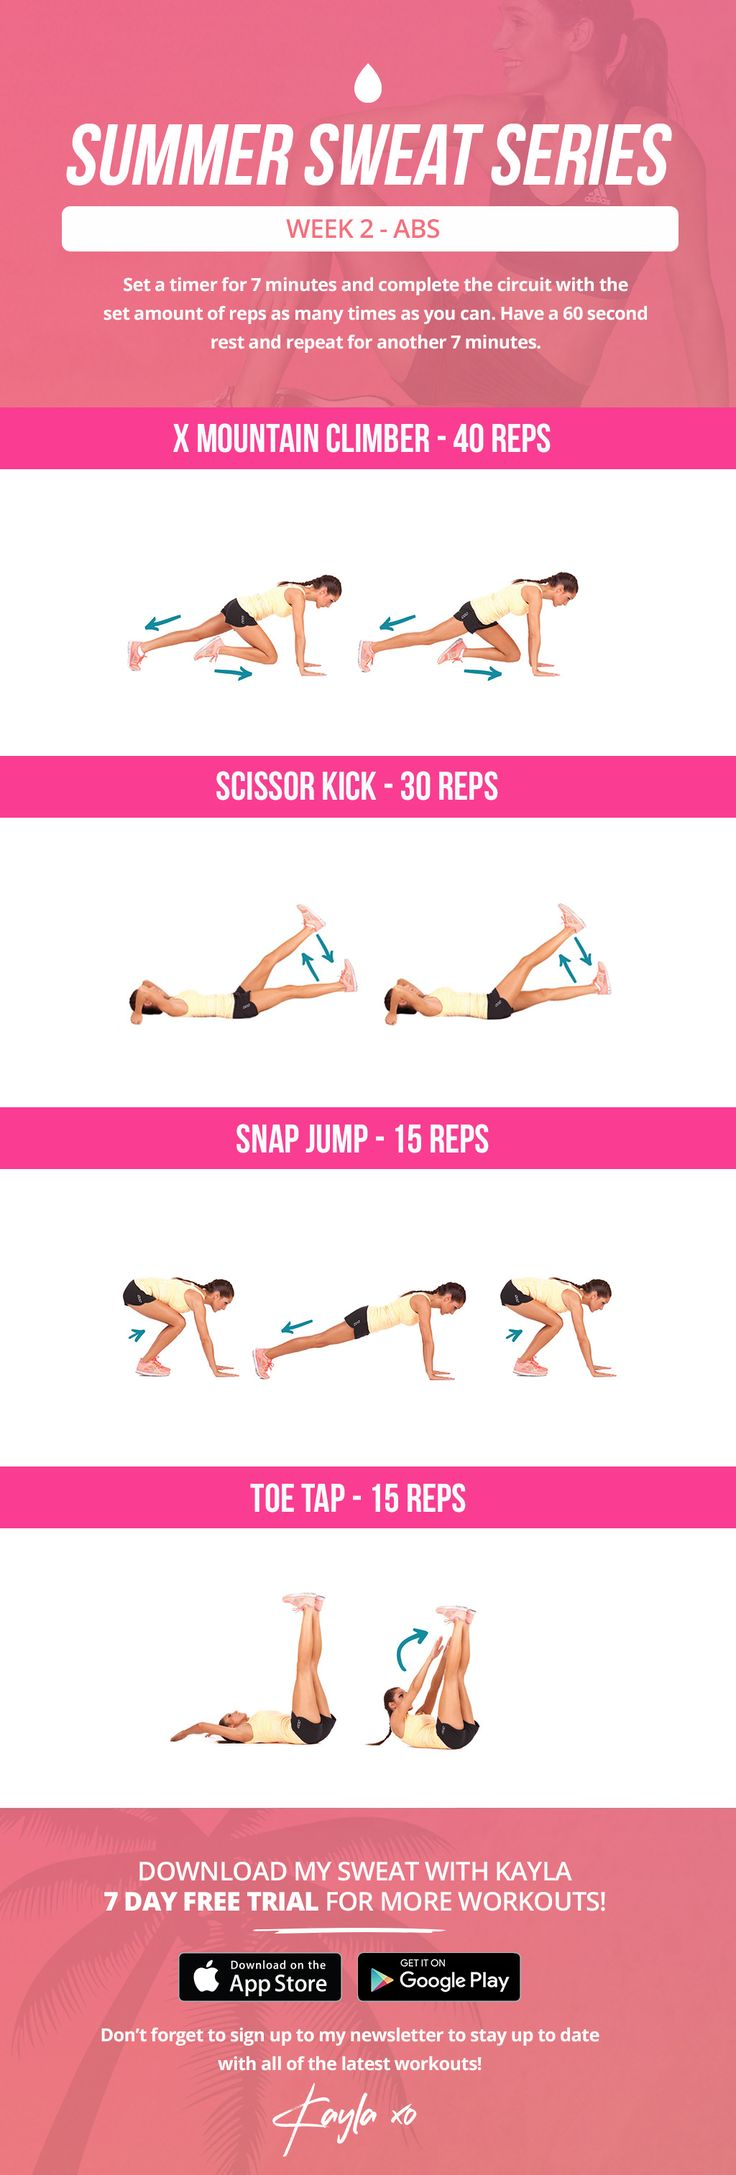 Abs Workout - Summer Sweat Series - Friday Week 2 – Kayla Itsines